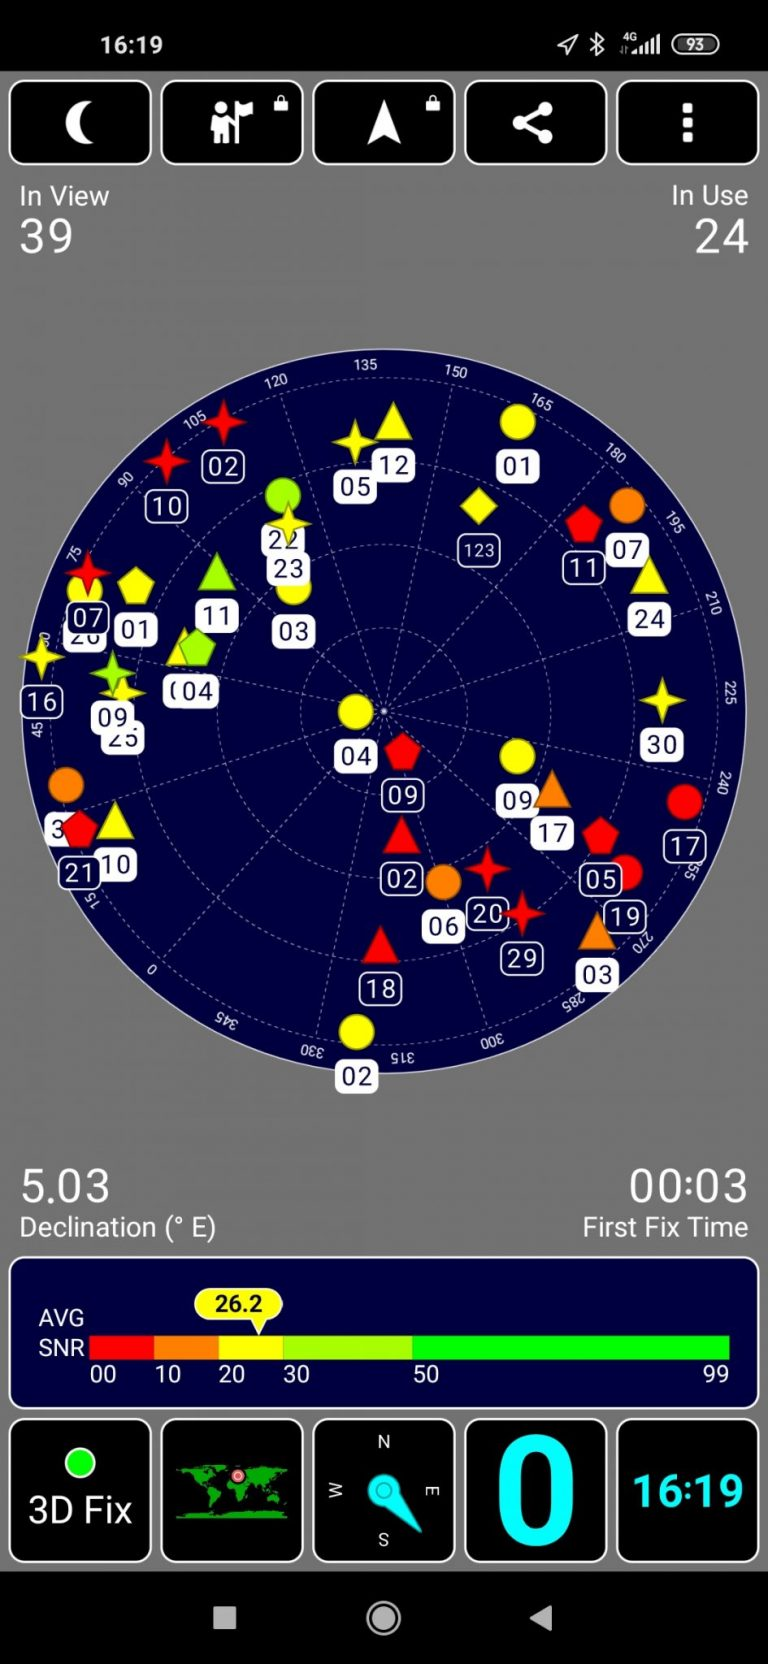 Redmi Note 9 okostelefon teszt 26